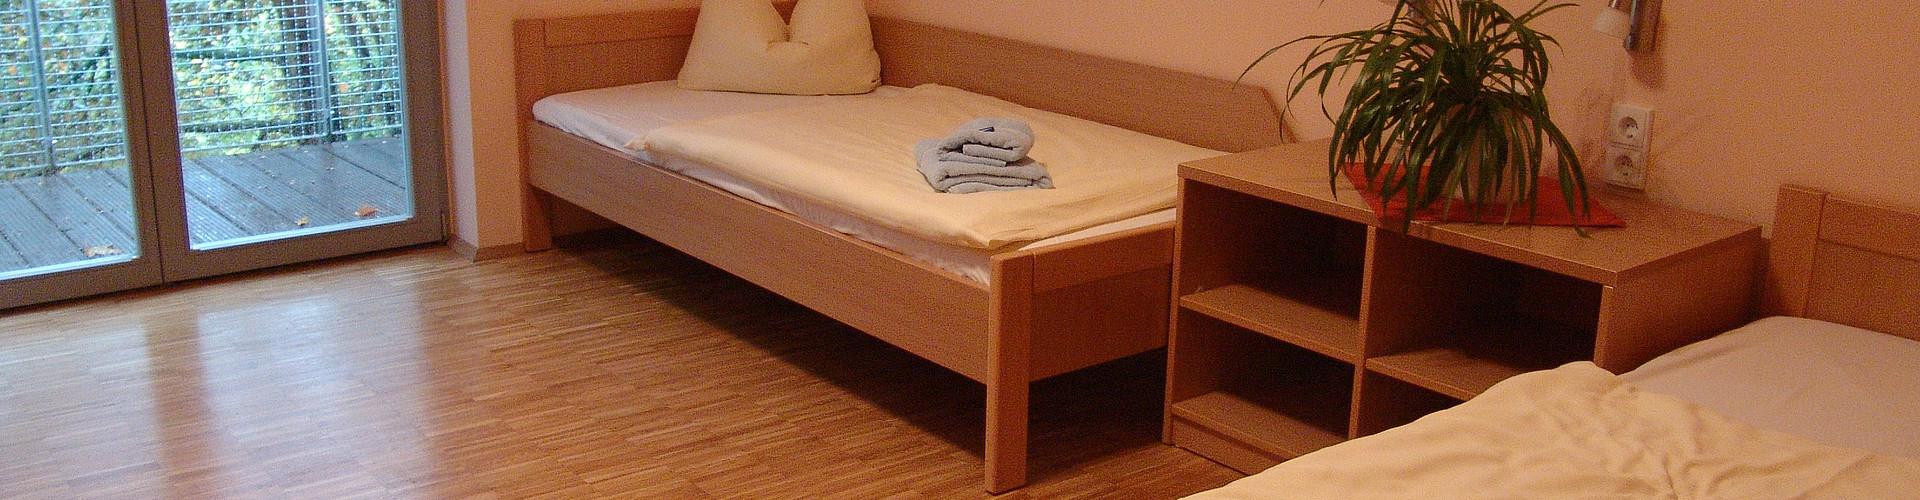 Schlafzimmer Lebenshilfe